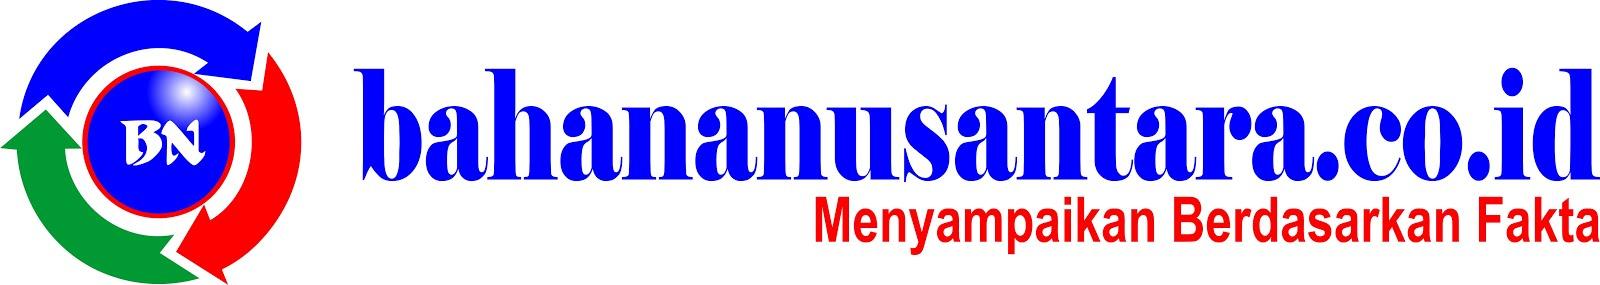 bahananusantara.co.id